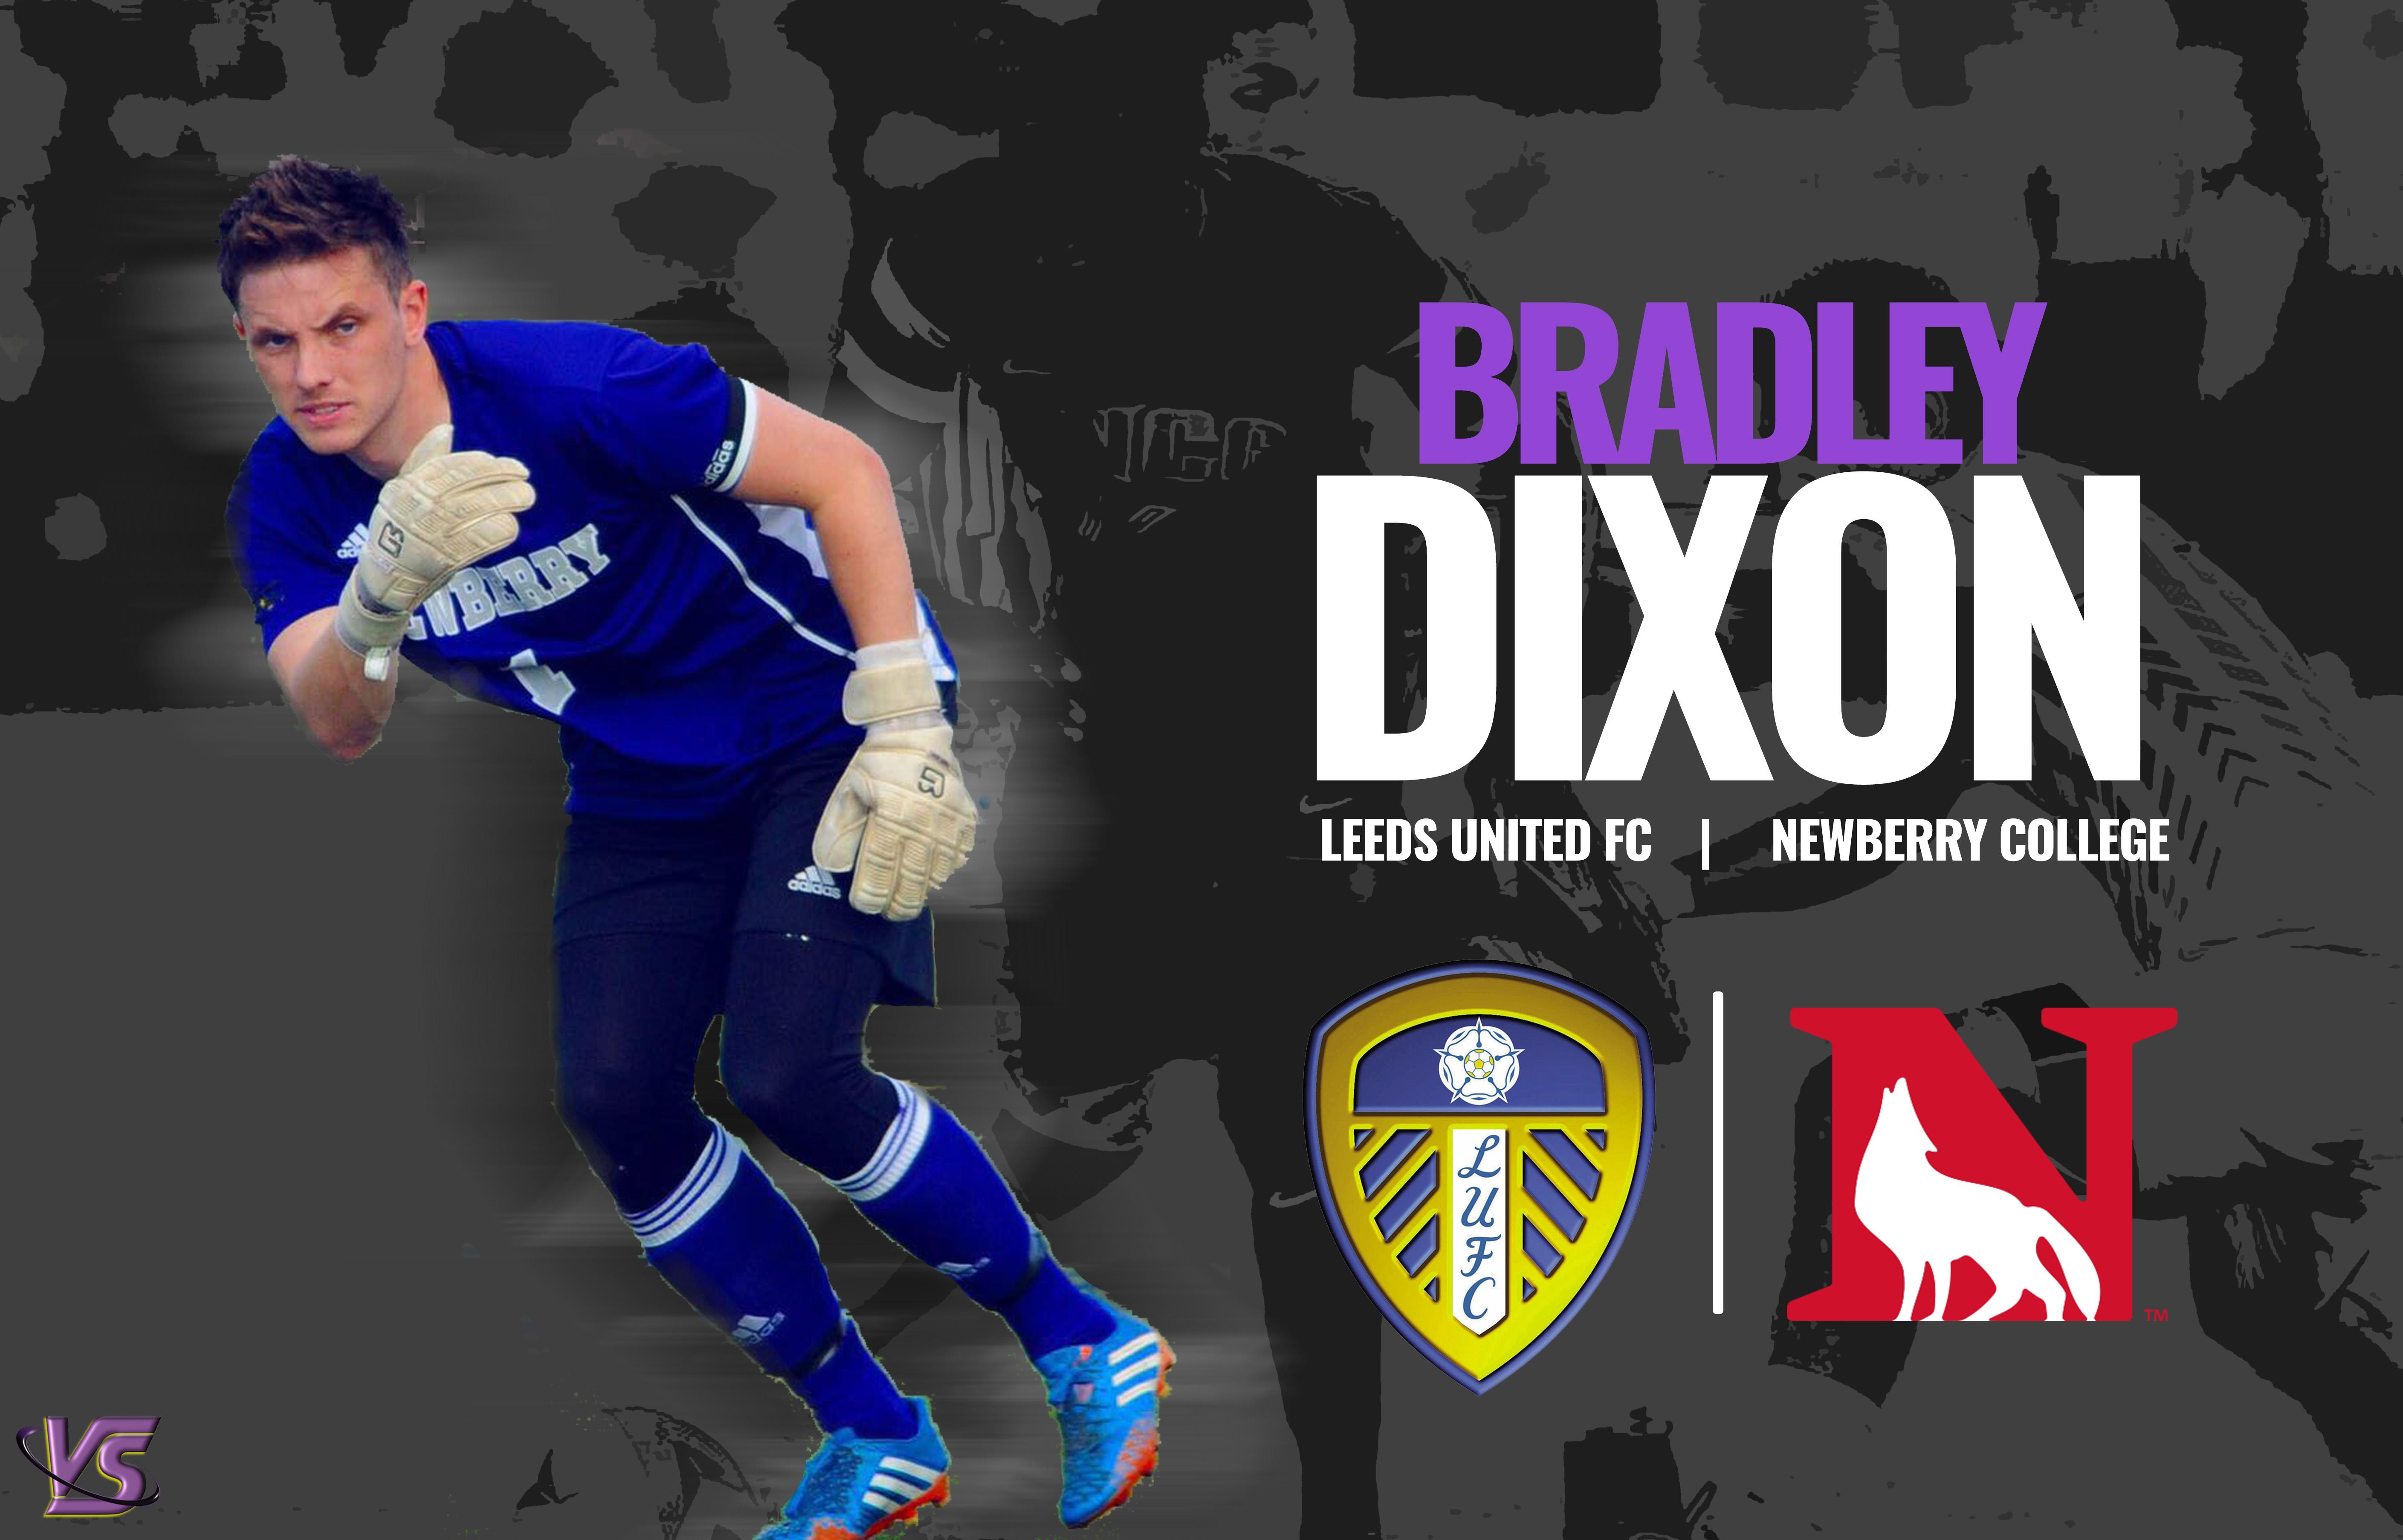 Bradley Dixon 2015